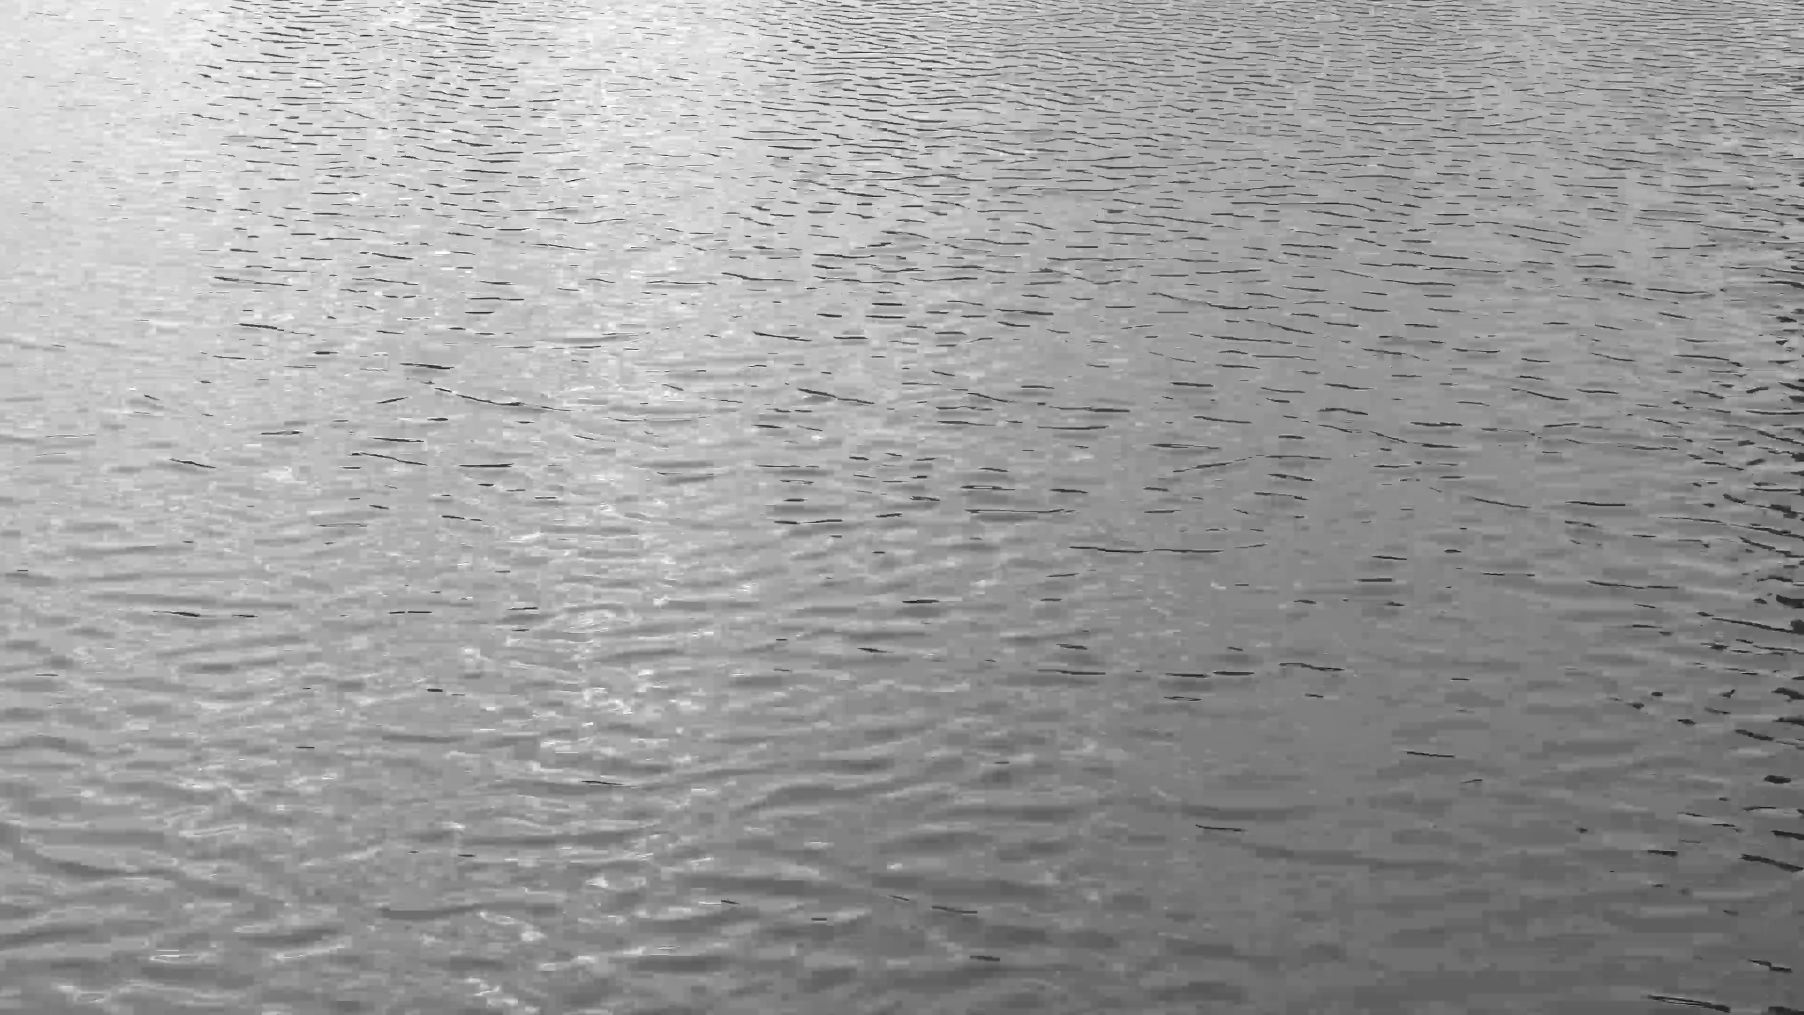 a video still from the Fujifilm GFX100 medium format camera featuring rippling waters of Lake Michigan